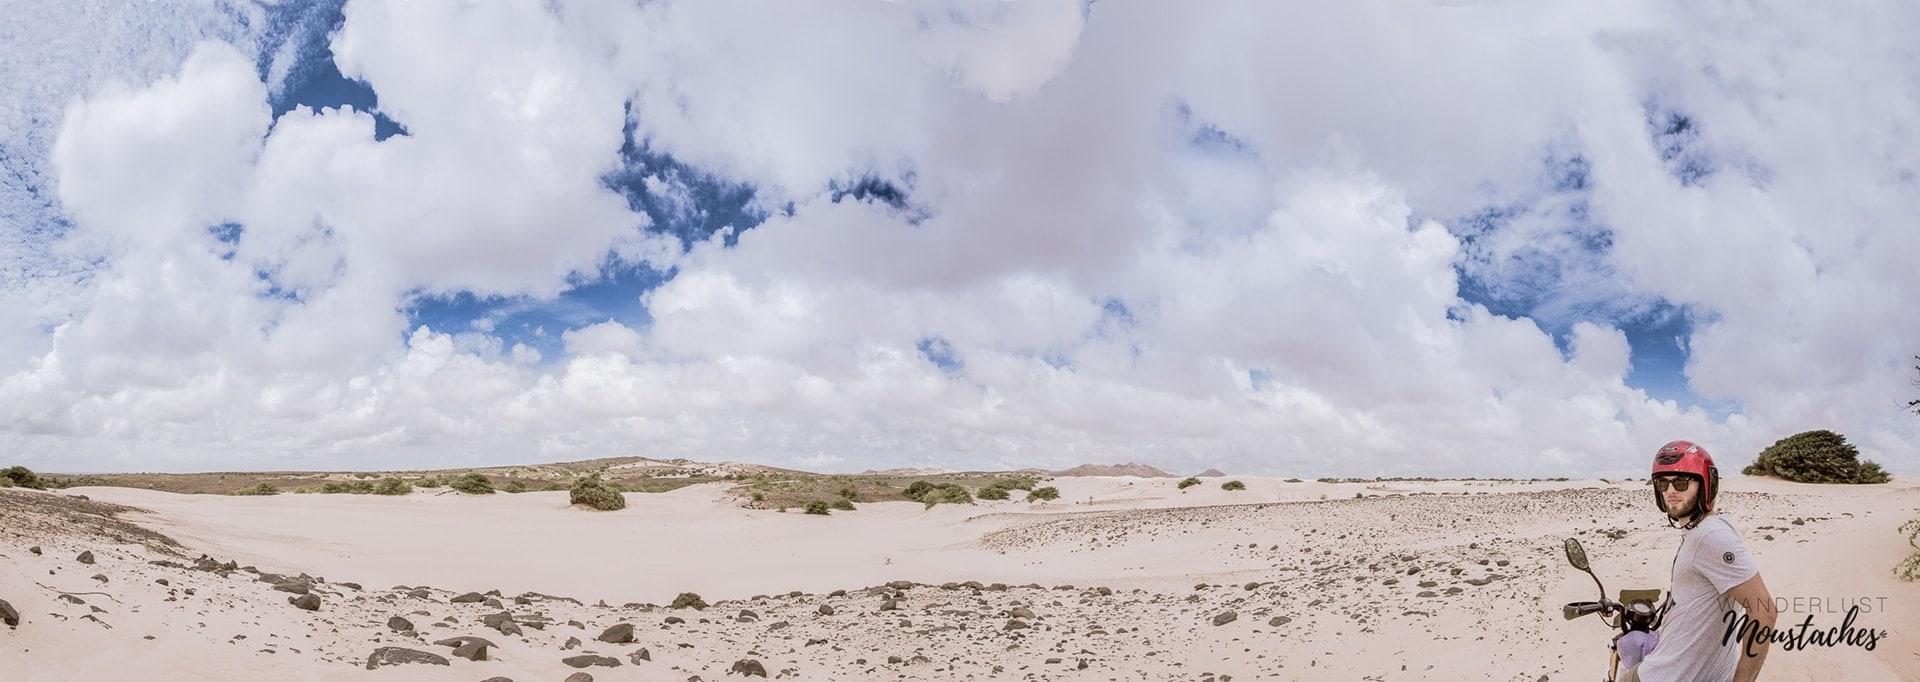 voyage-photo-moustachesenvadrouille-sabine-kley-cabo-verde-deserto-viana-panorama-46